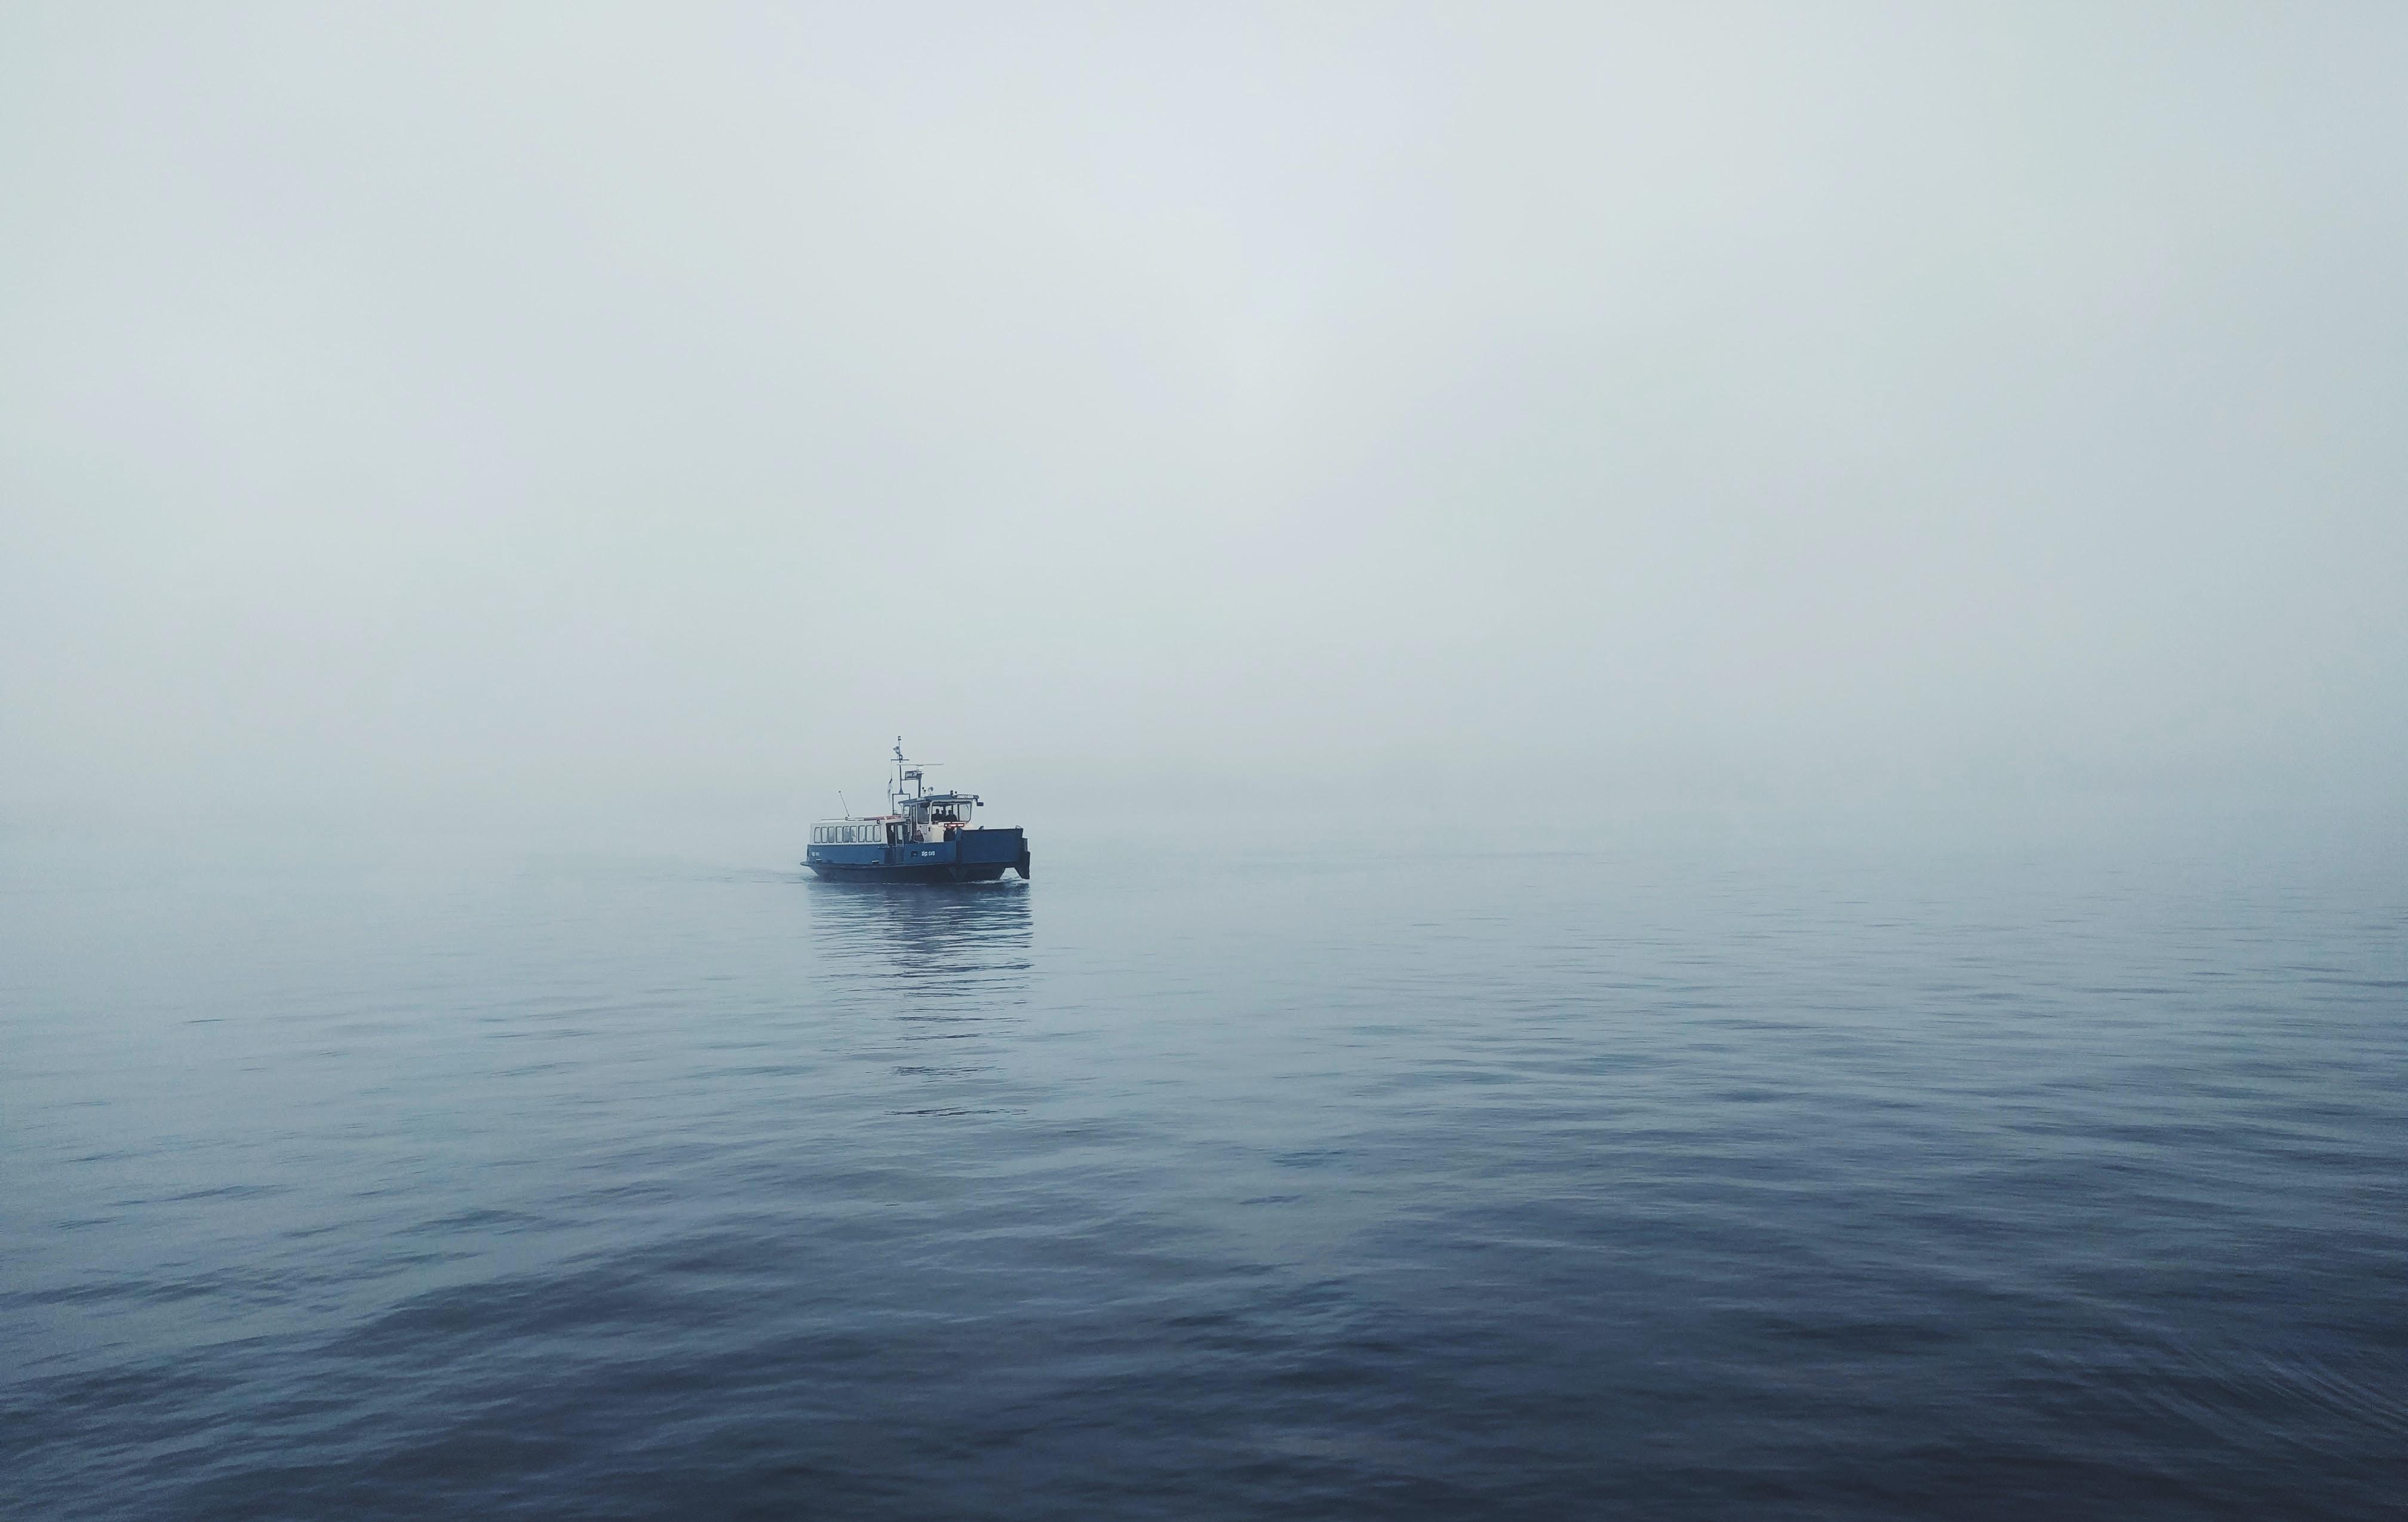 Working boat crosses a foggy sea in Amsterdam